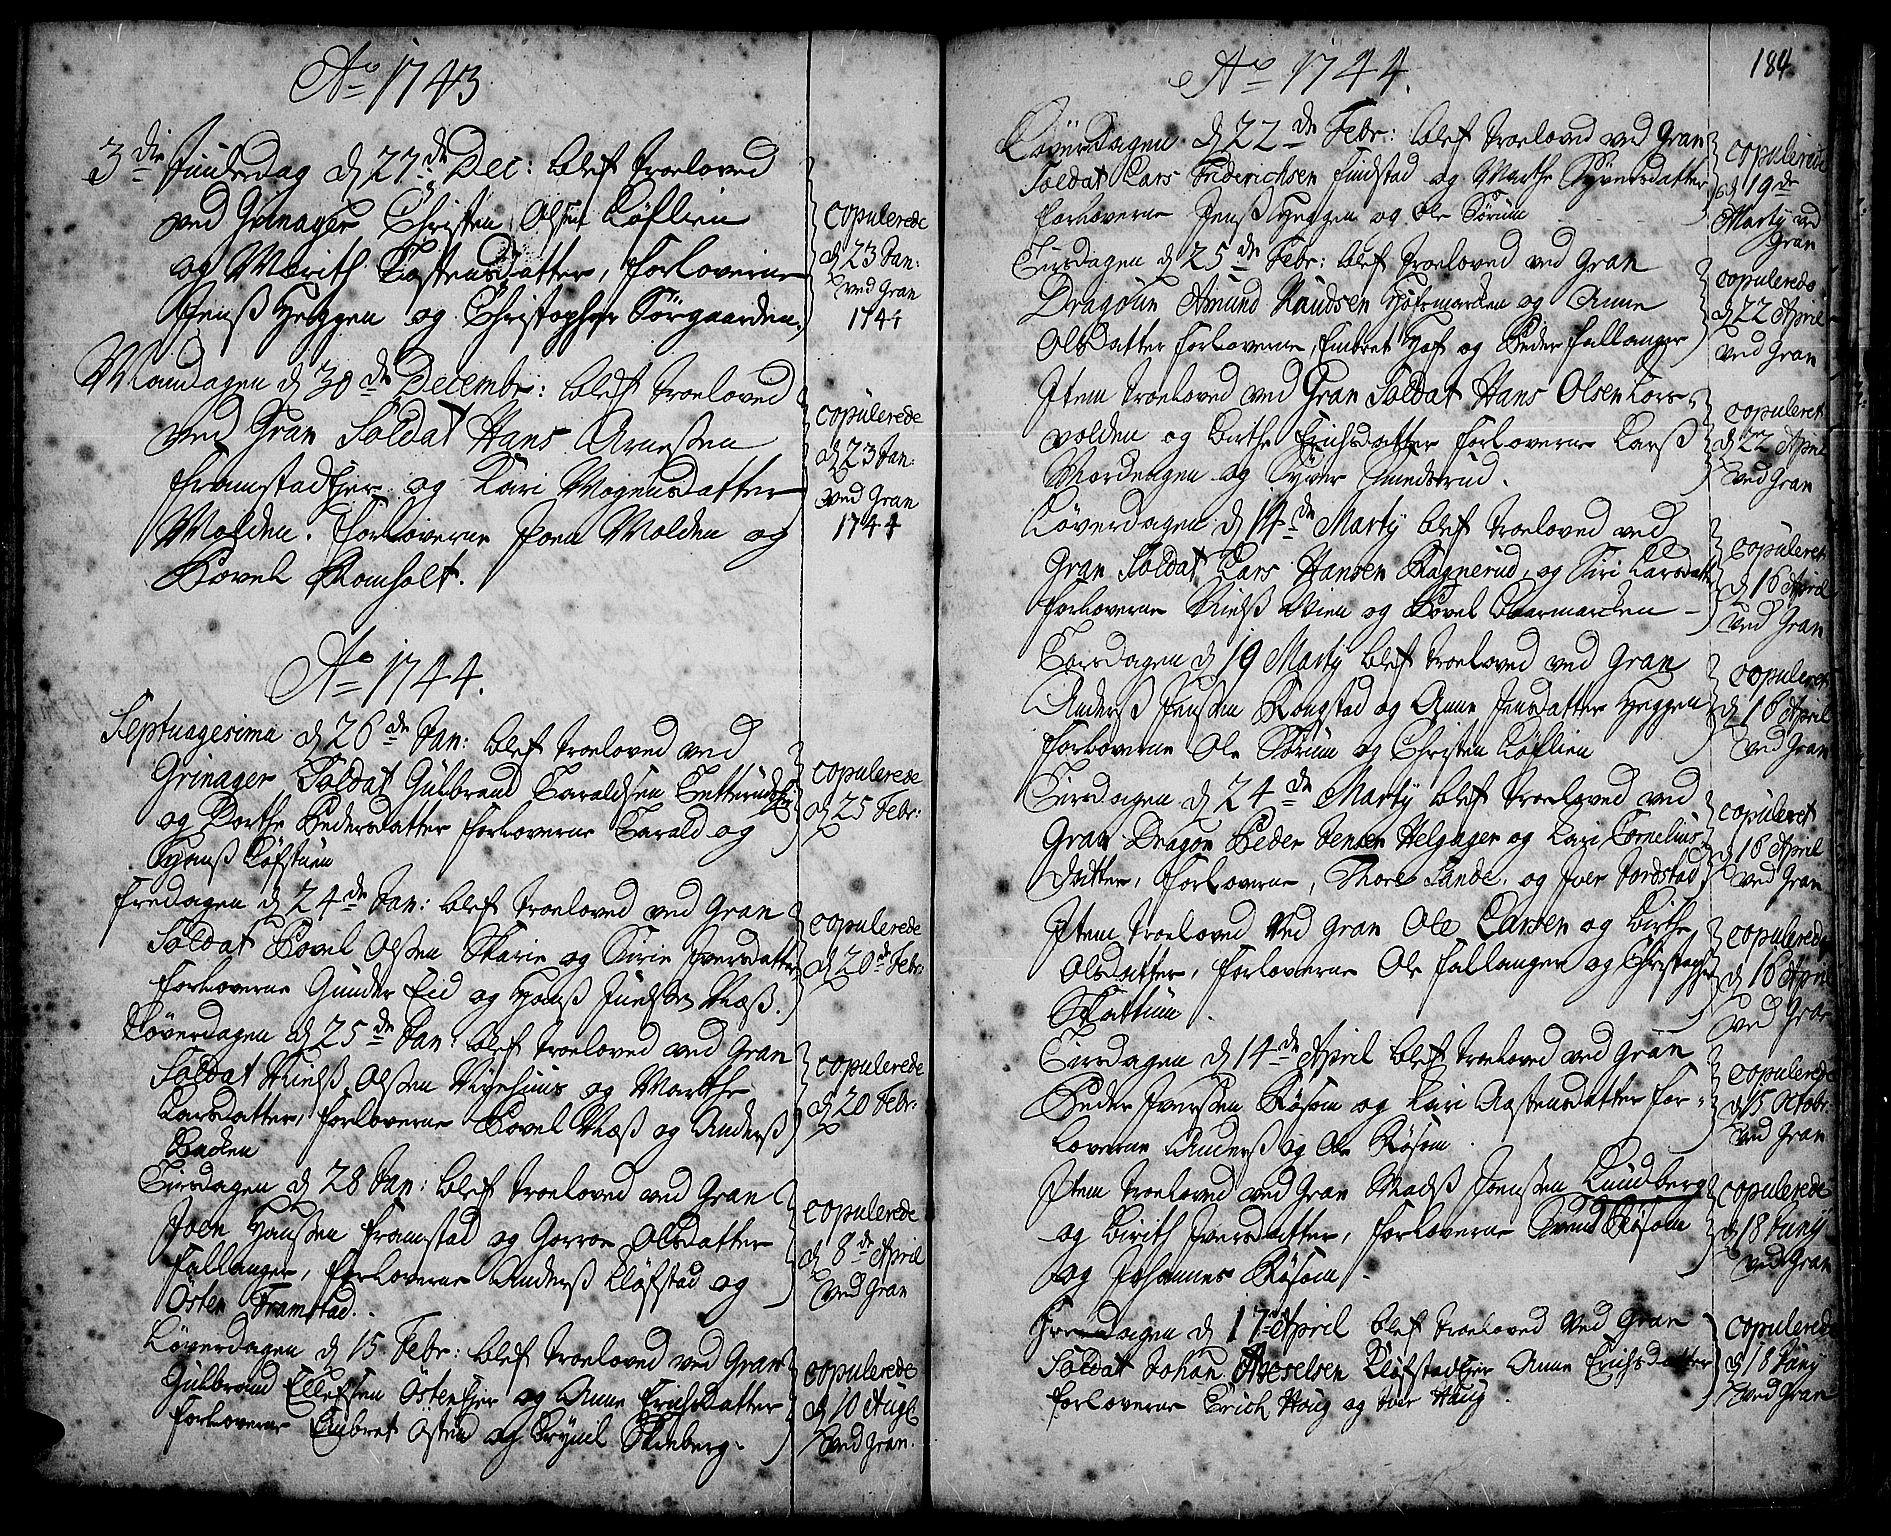 SAH, Gran prestekontor, Ministerialbok nr. 2, 1732-1744, s. 184